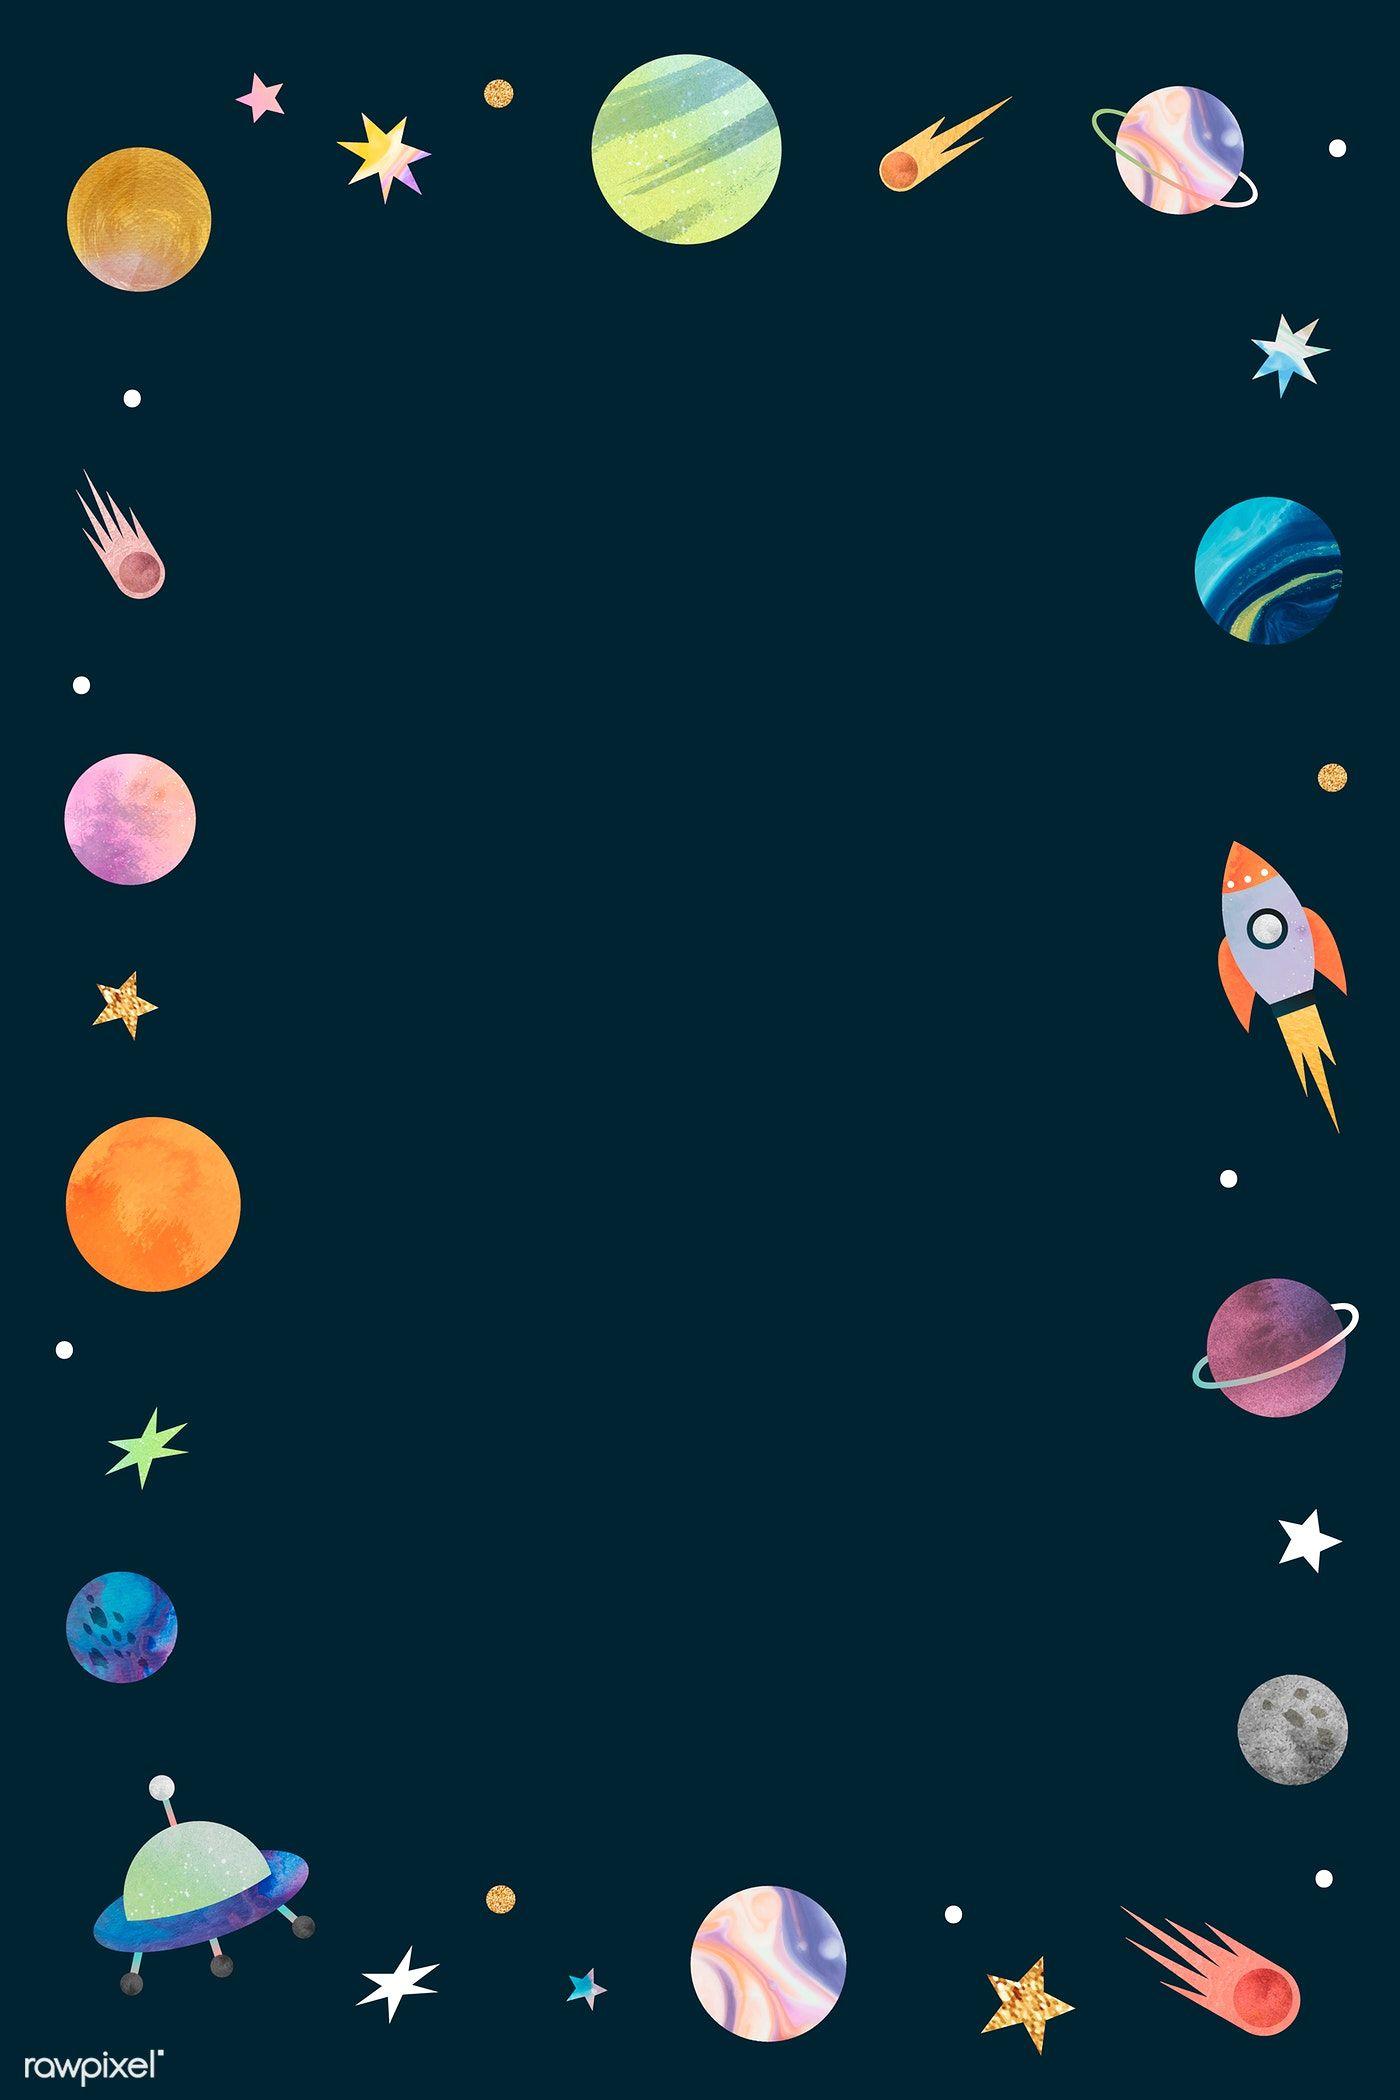 Download Premium Vector Of Colorful Galaxy Watercolor Doodle Frame On Watercolor Galaxy Doodle Frame Art Wallpaper Iphone